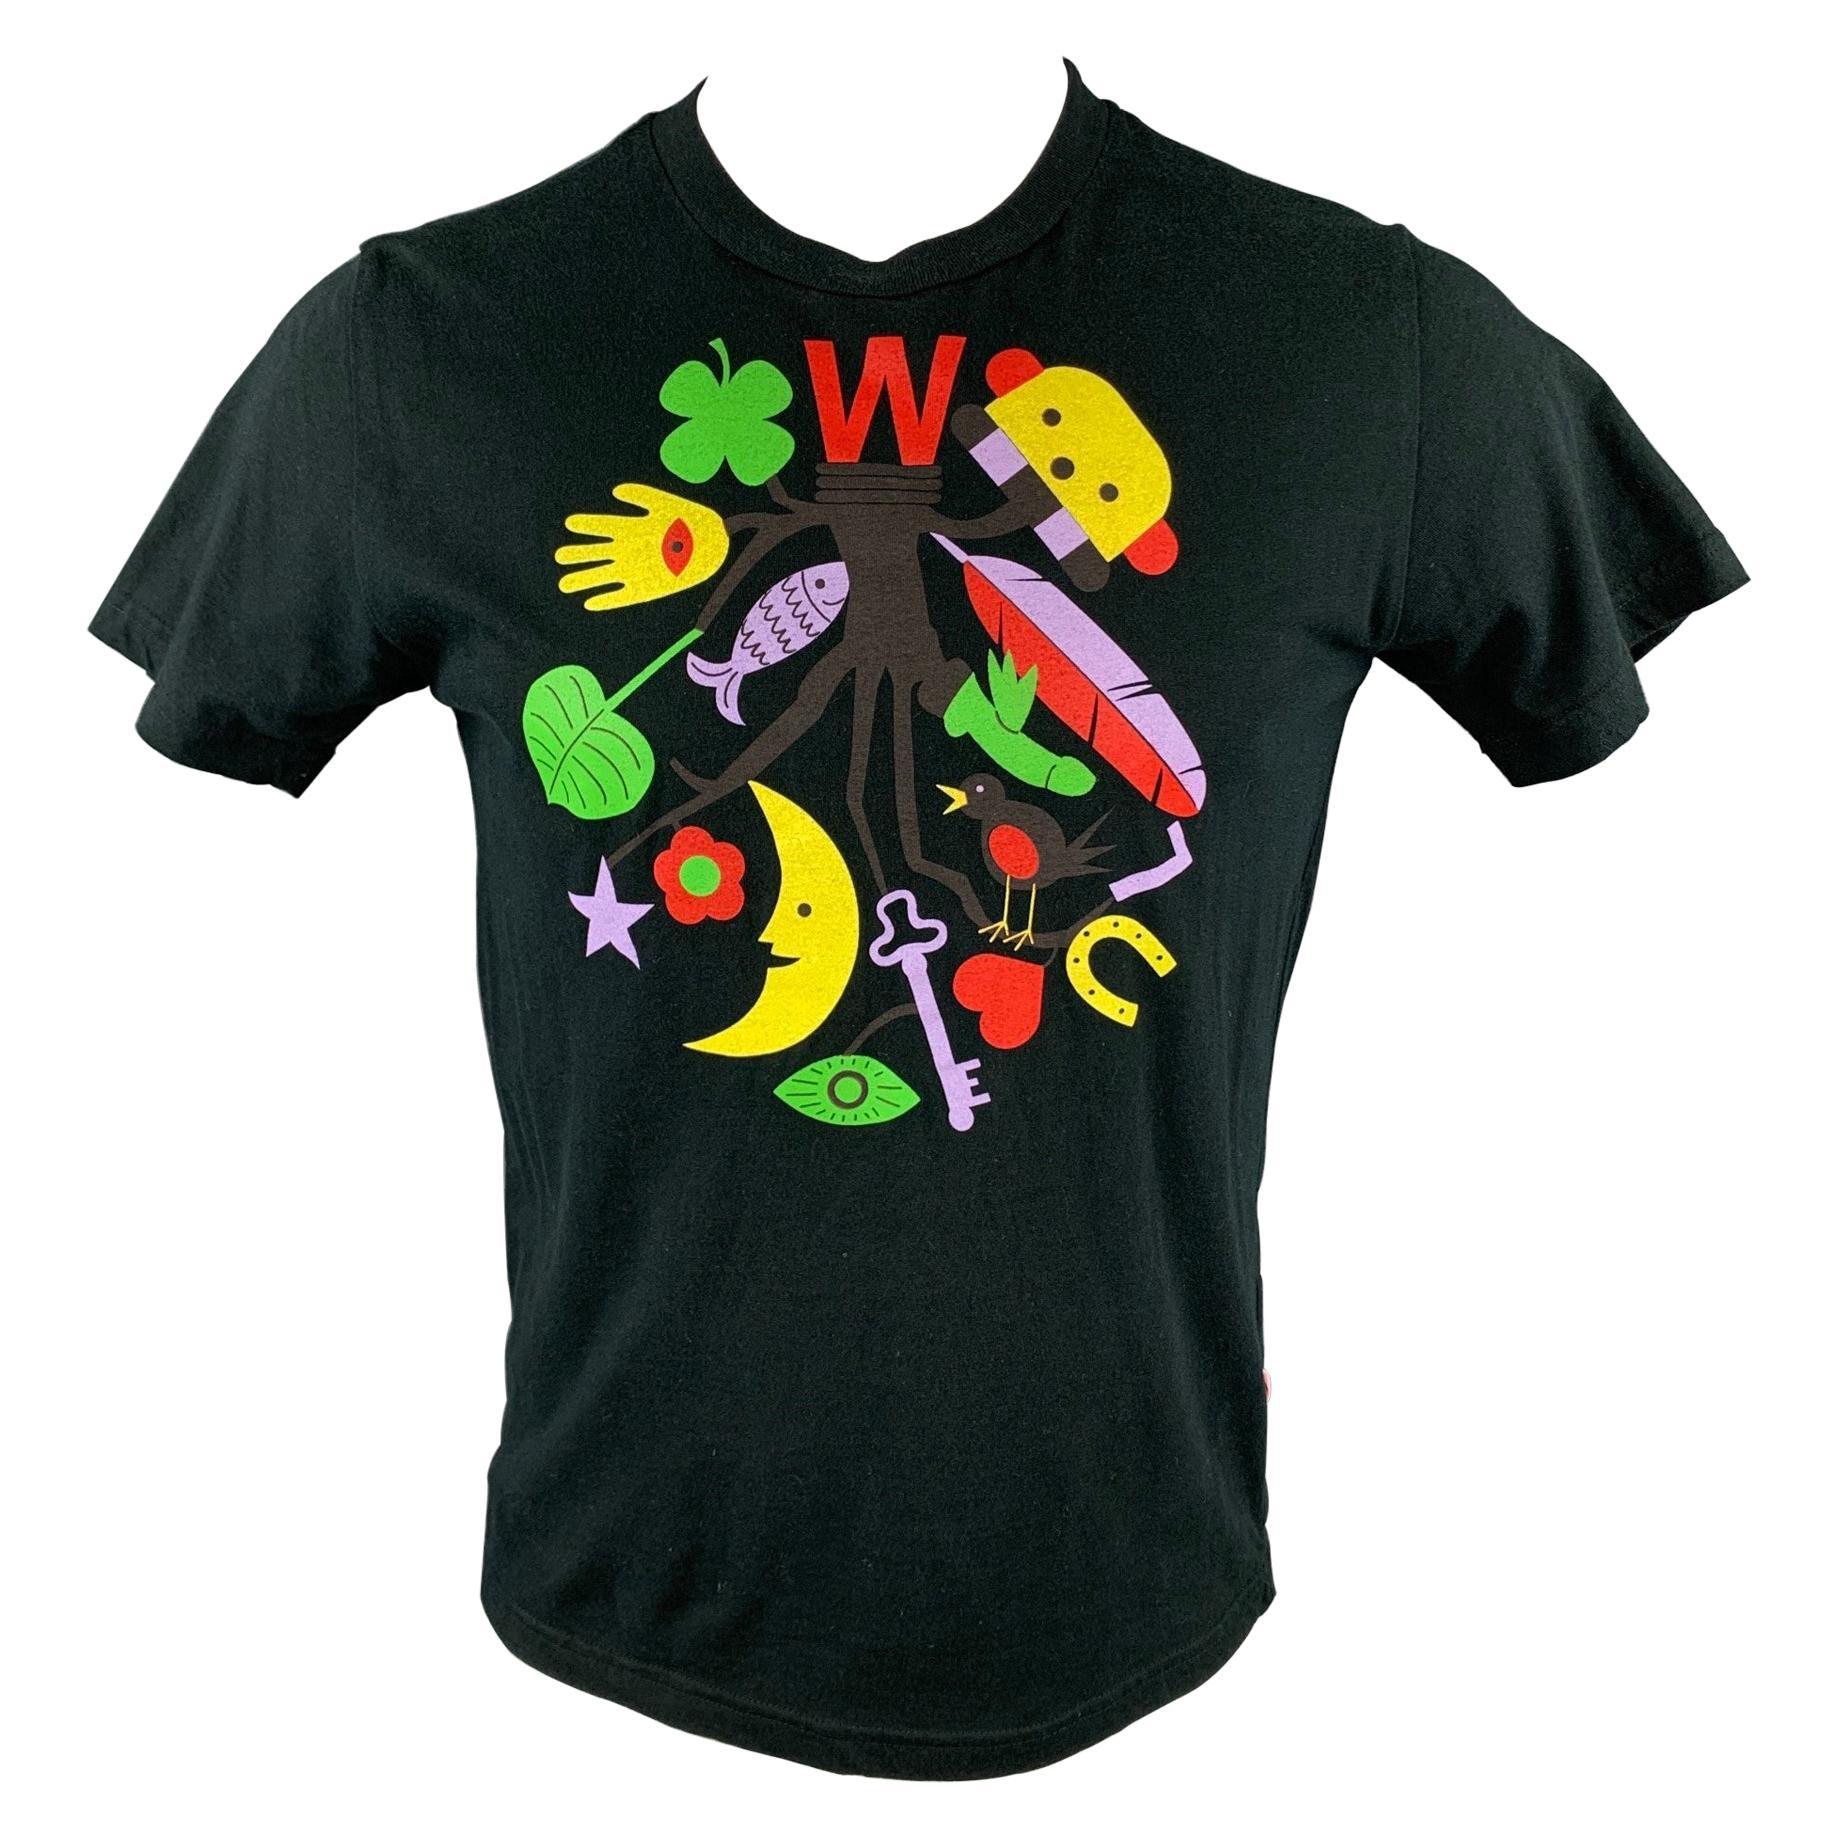 WALTER VAN BEIRENDONCK Size M Black Graphic Cotton Crew-Neck T-shirt